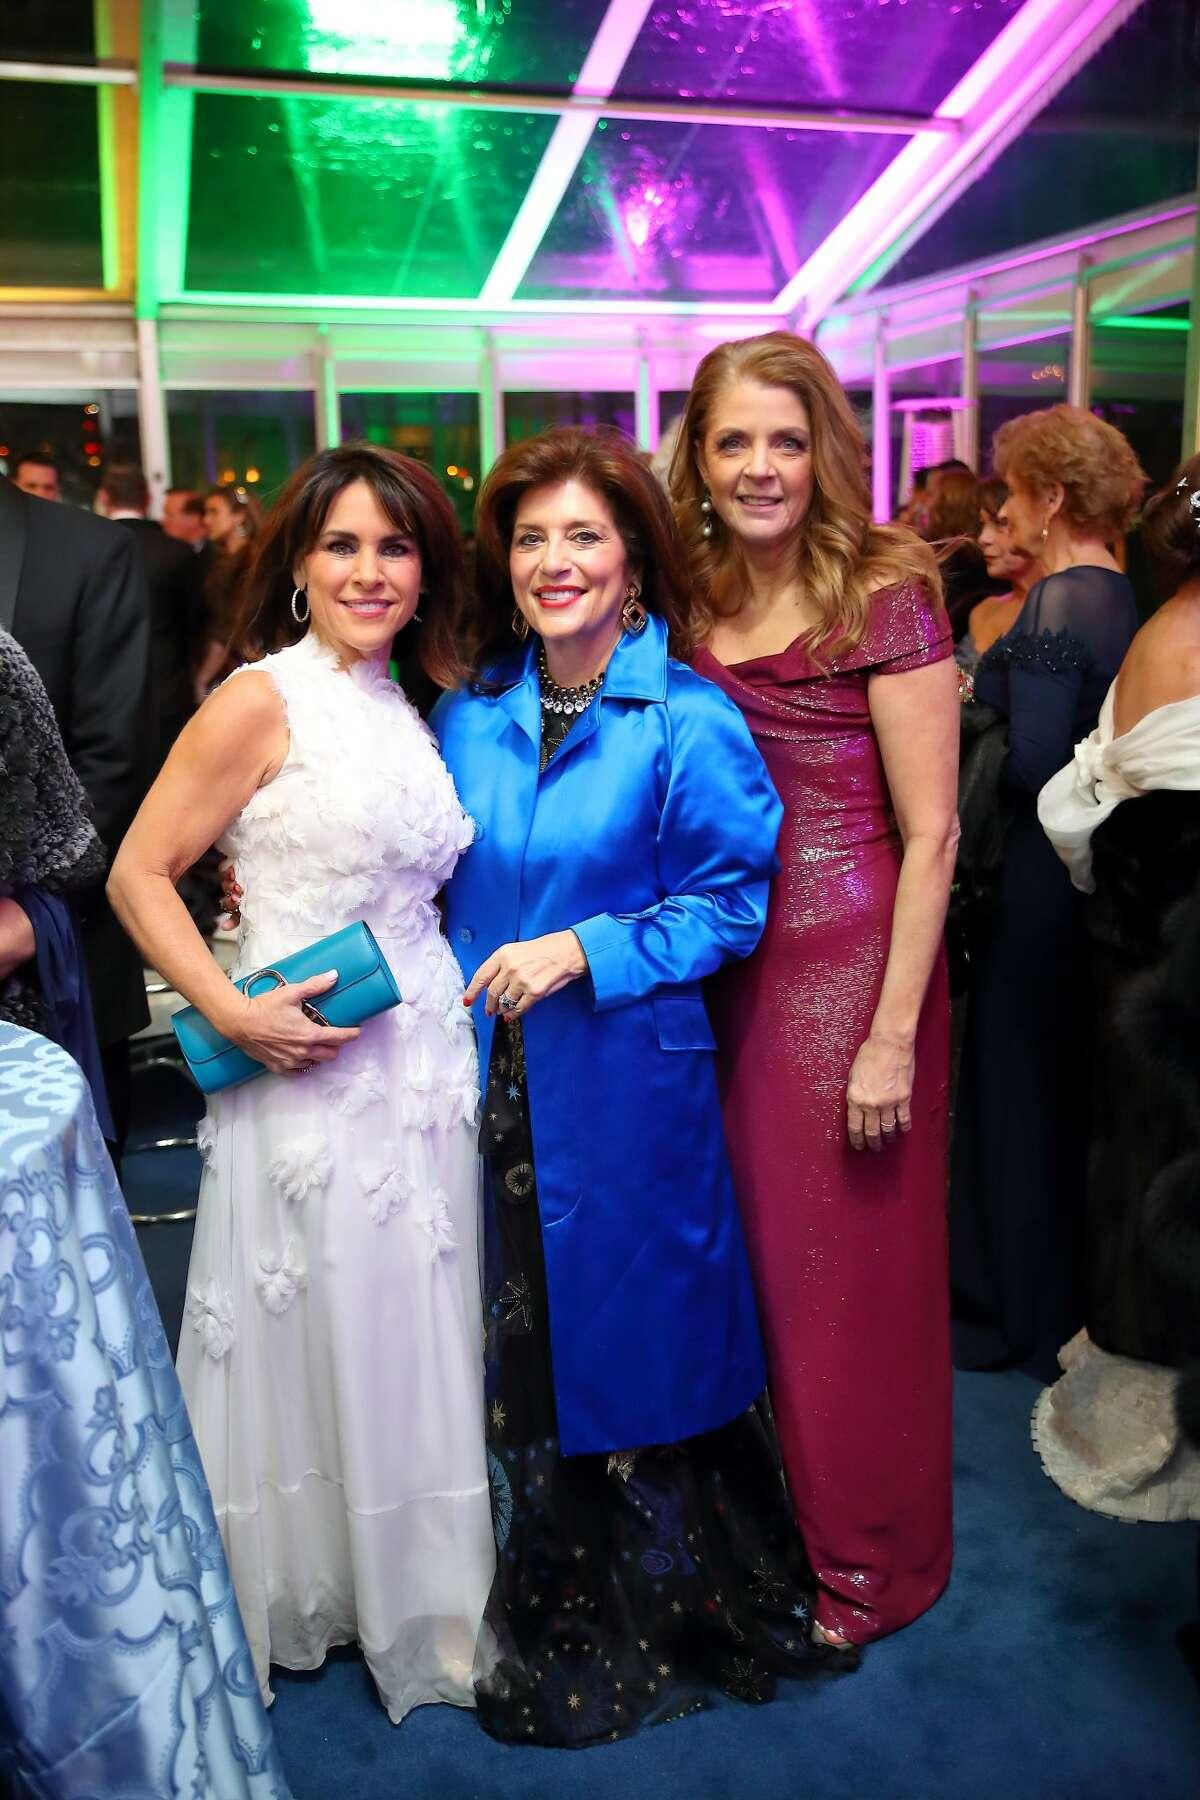 Maria Bush, Dancie Ware and Paige Fertitta at the San Luis Salute in Galveston, Texas on February 21, 2020